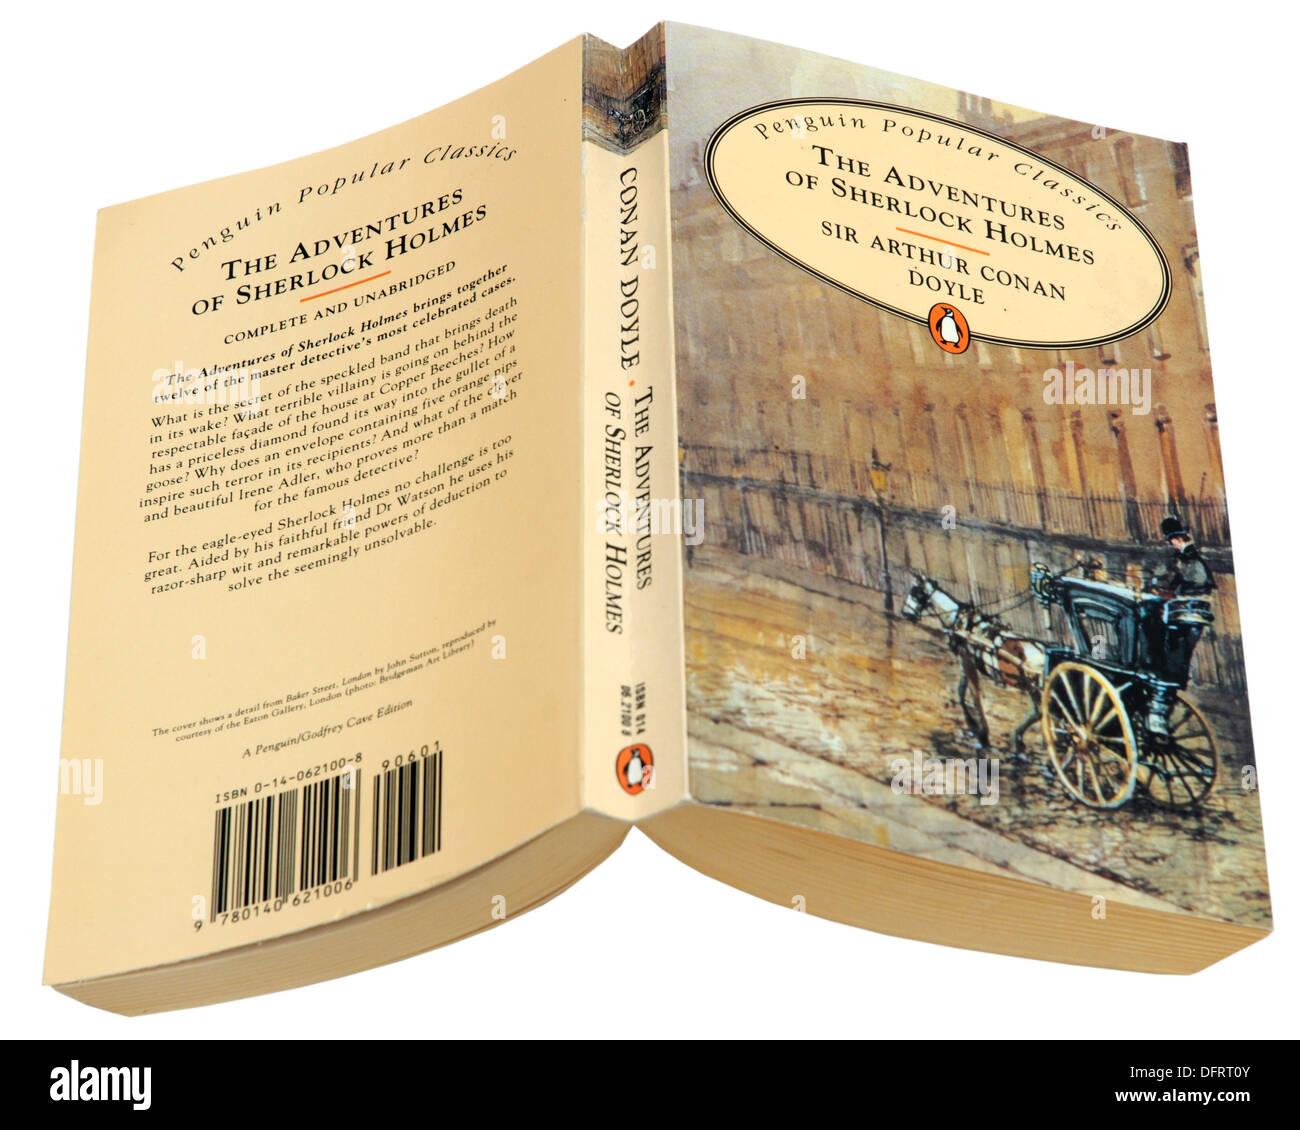 The Adventures of Sherlock Holmes by Sir Arthur Conan Doyle - Stock Image